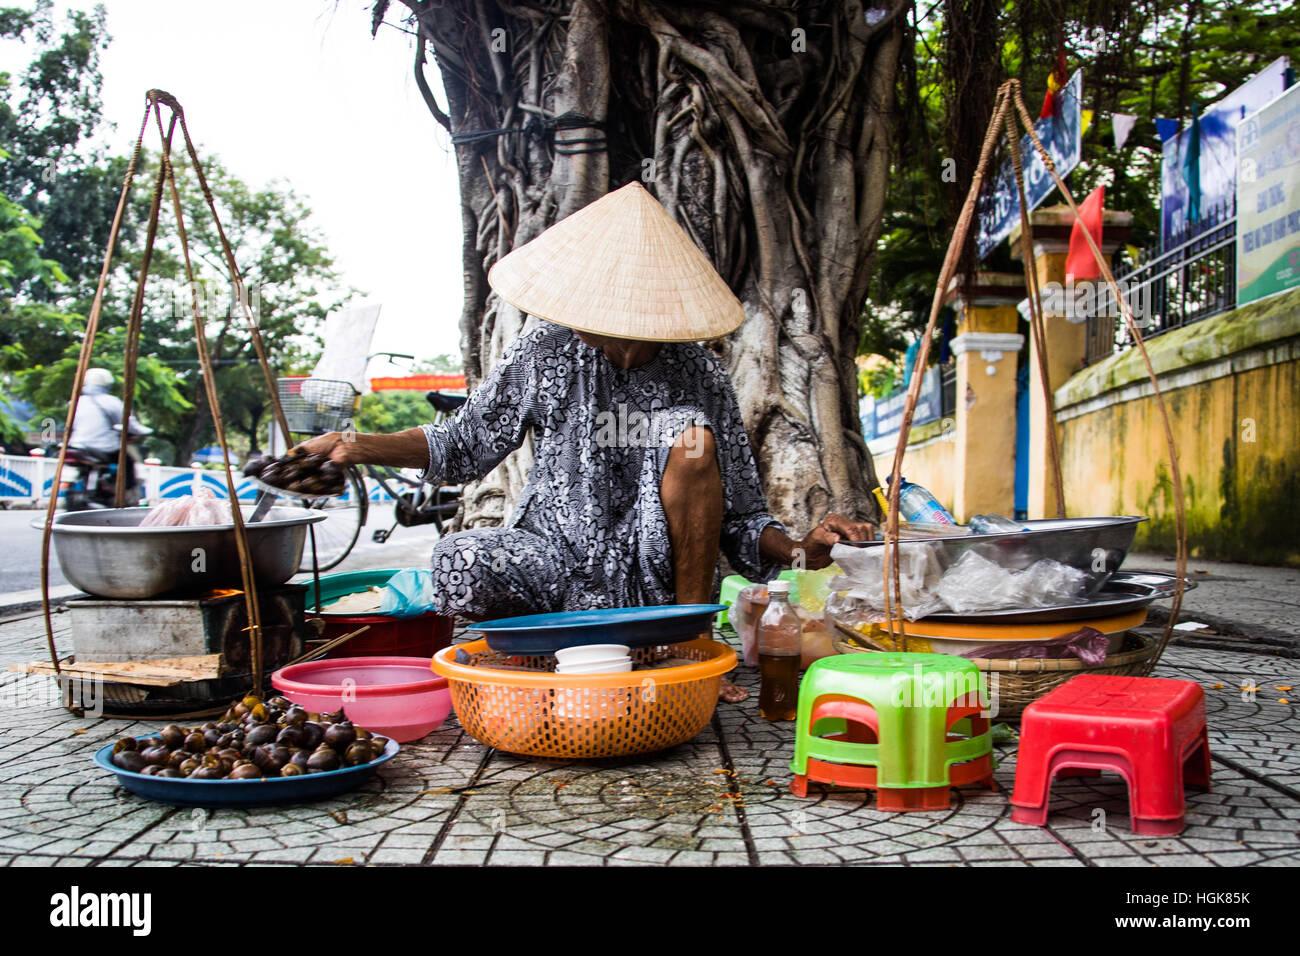 Woman selling shellfish in Hue, Vietnam - Stock Image